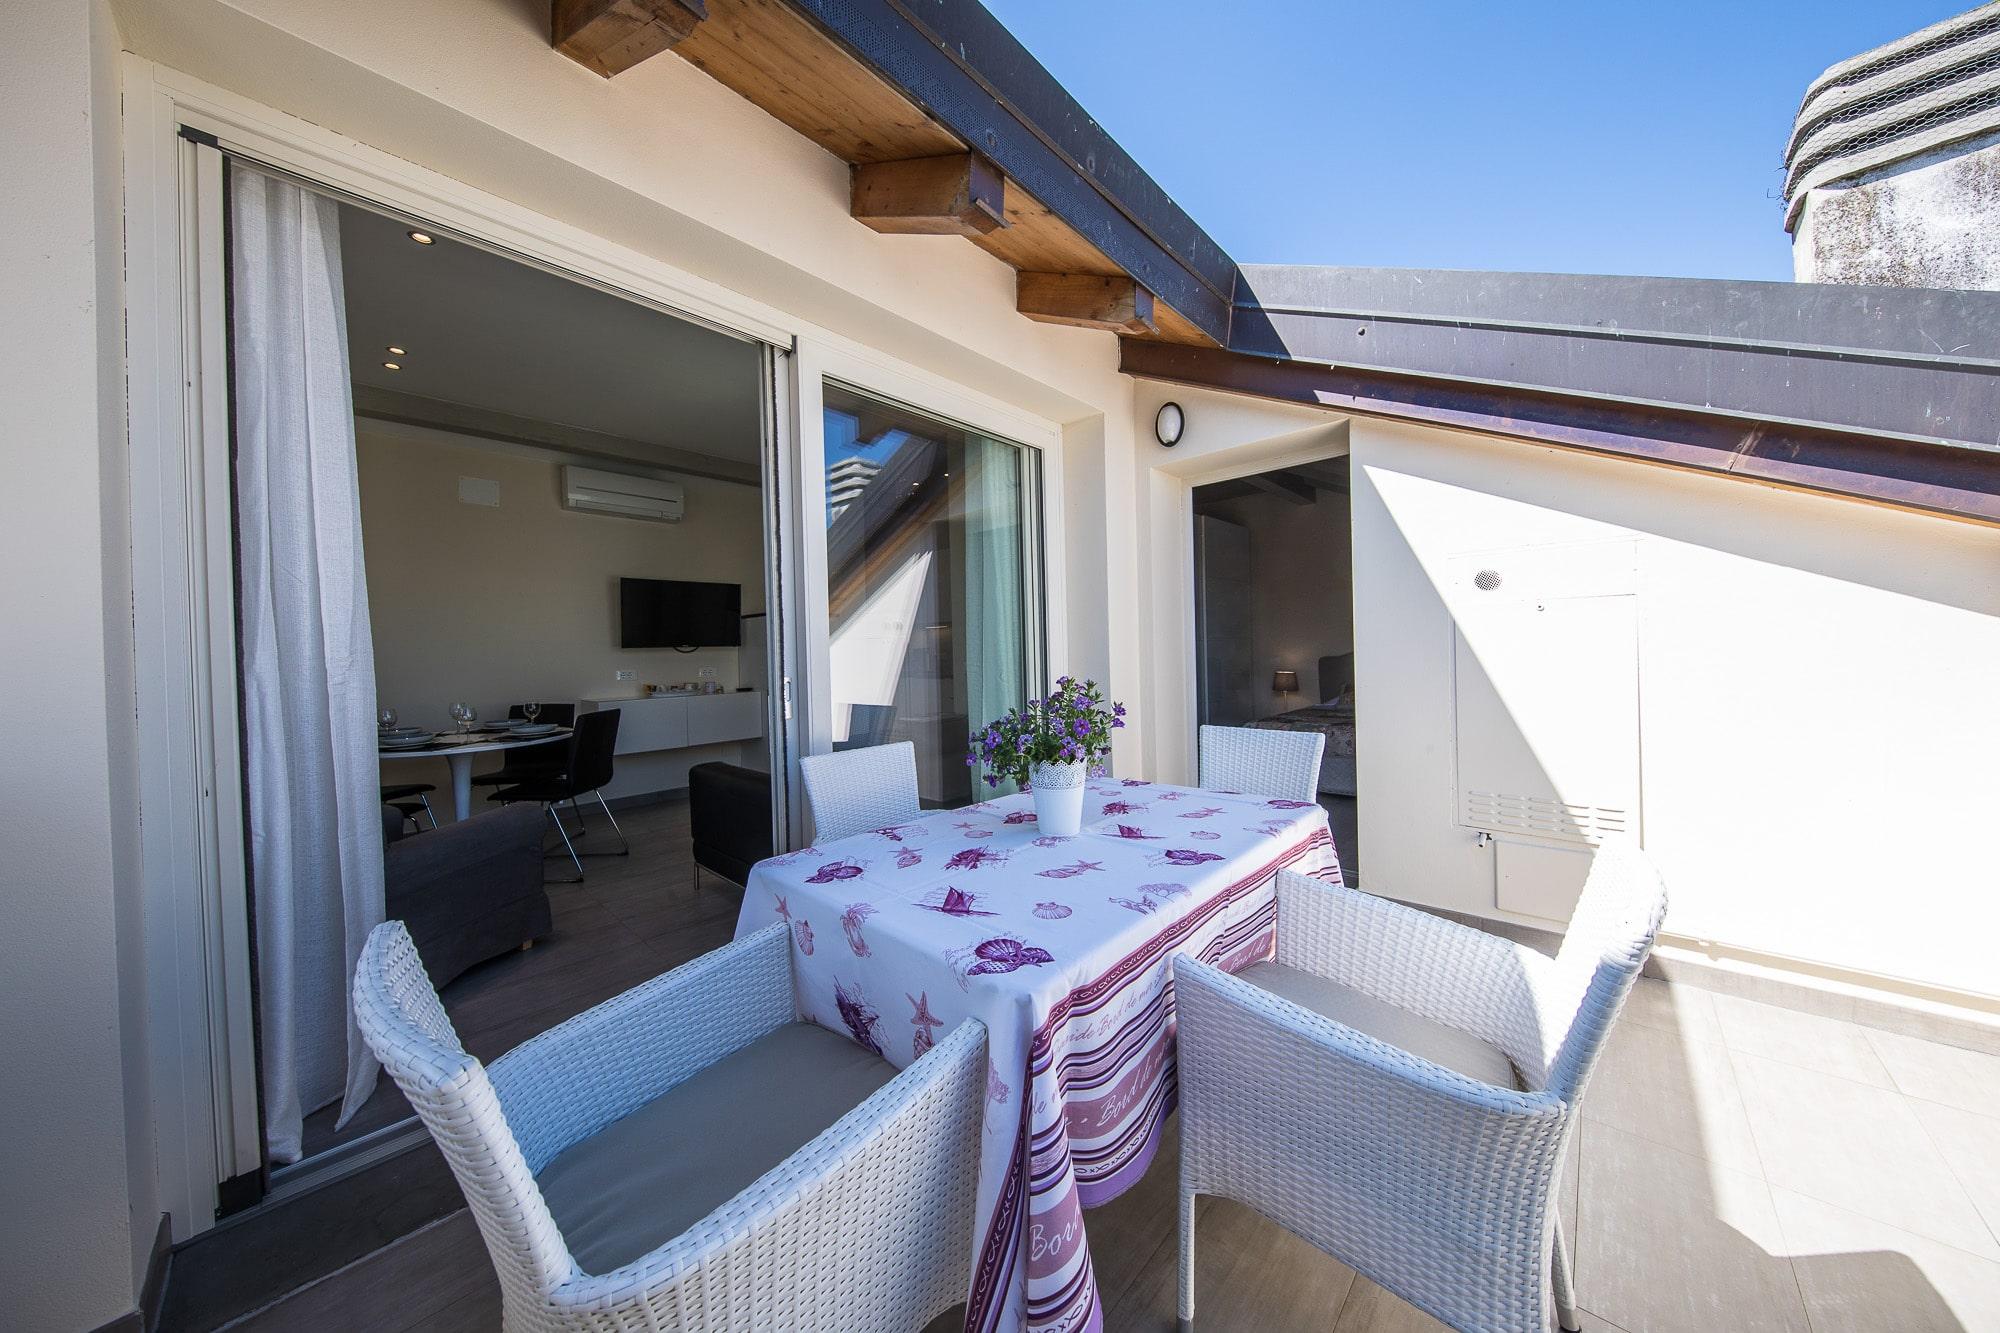 Wohnung 10 apartments sirmione for Velux prezzi 2016